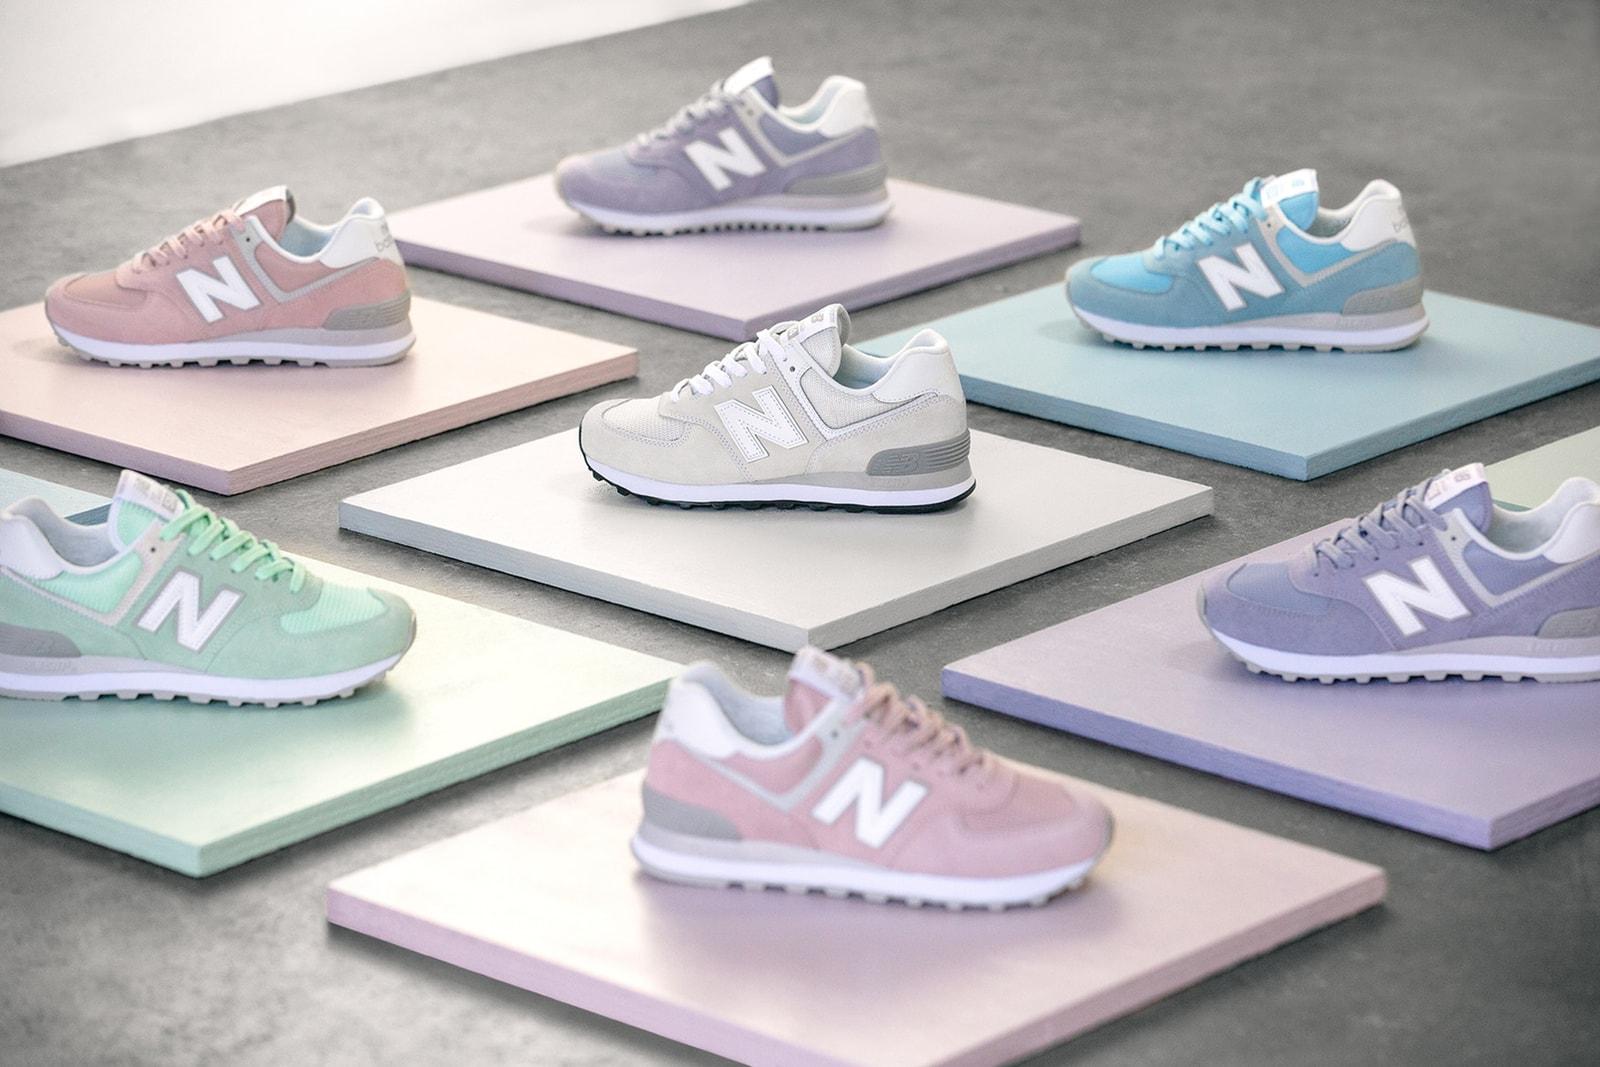 New Balance Classic 574 Pastel Pack Nike Air Max 180 Comme des Garcons Air More Uptempo ColourPop cosmetics lux lipsticks vegan arkk copenhagen desert camo where to buy